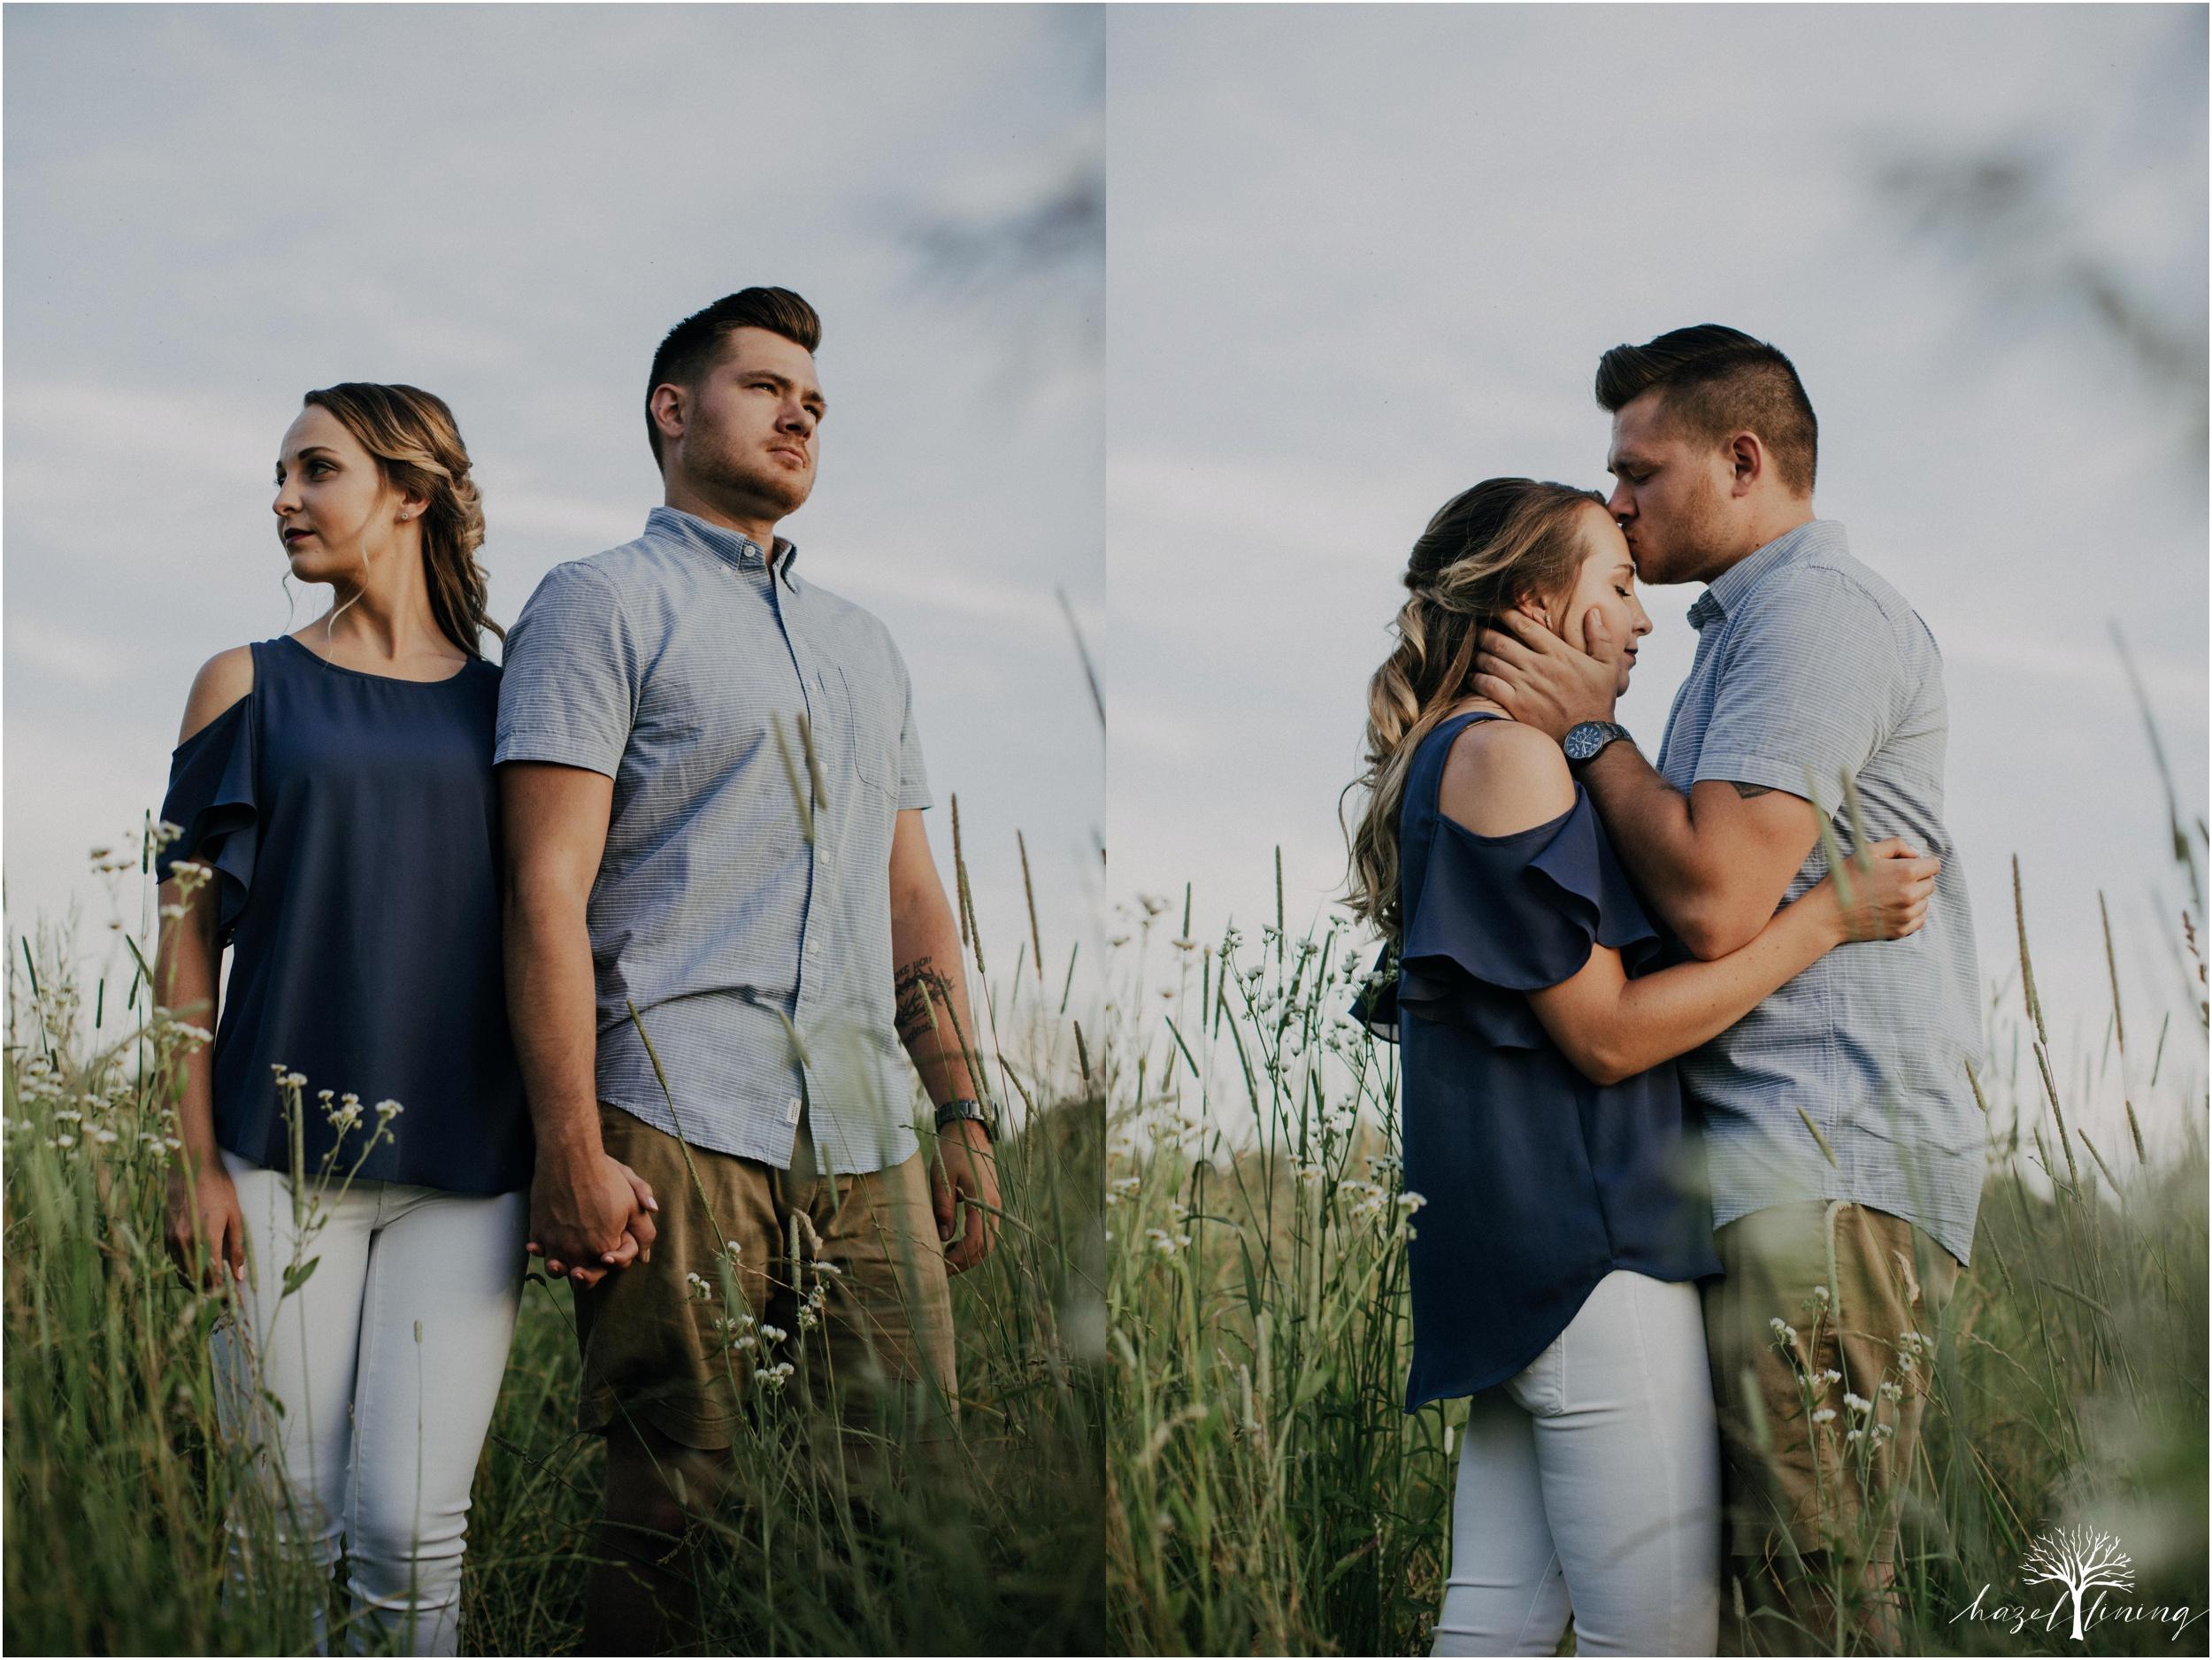 rachel-warner-chris-niedrist-the-farm-bakery-and-events-quakertown-pa-summer-engagement-hazel-lining-photography-destination-elopement-wedding-engagement-photography_0046.jpg